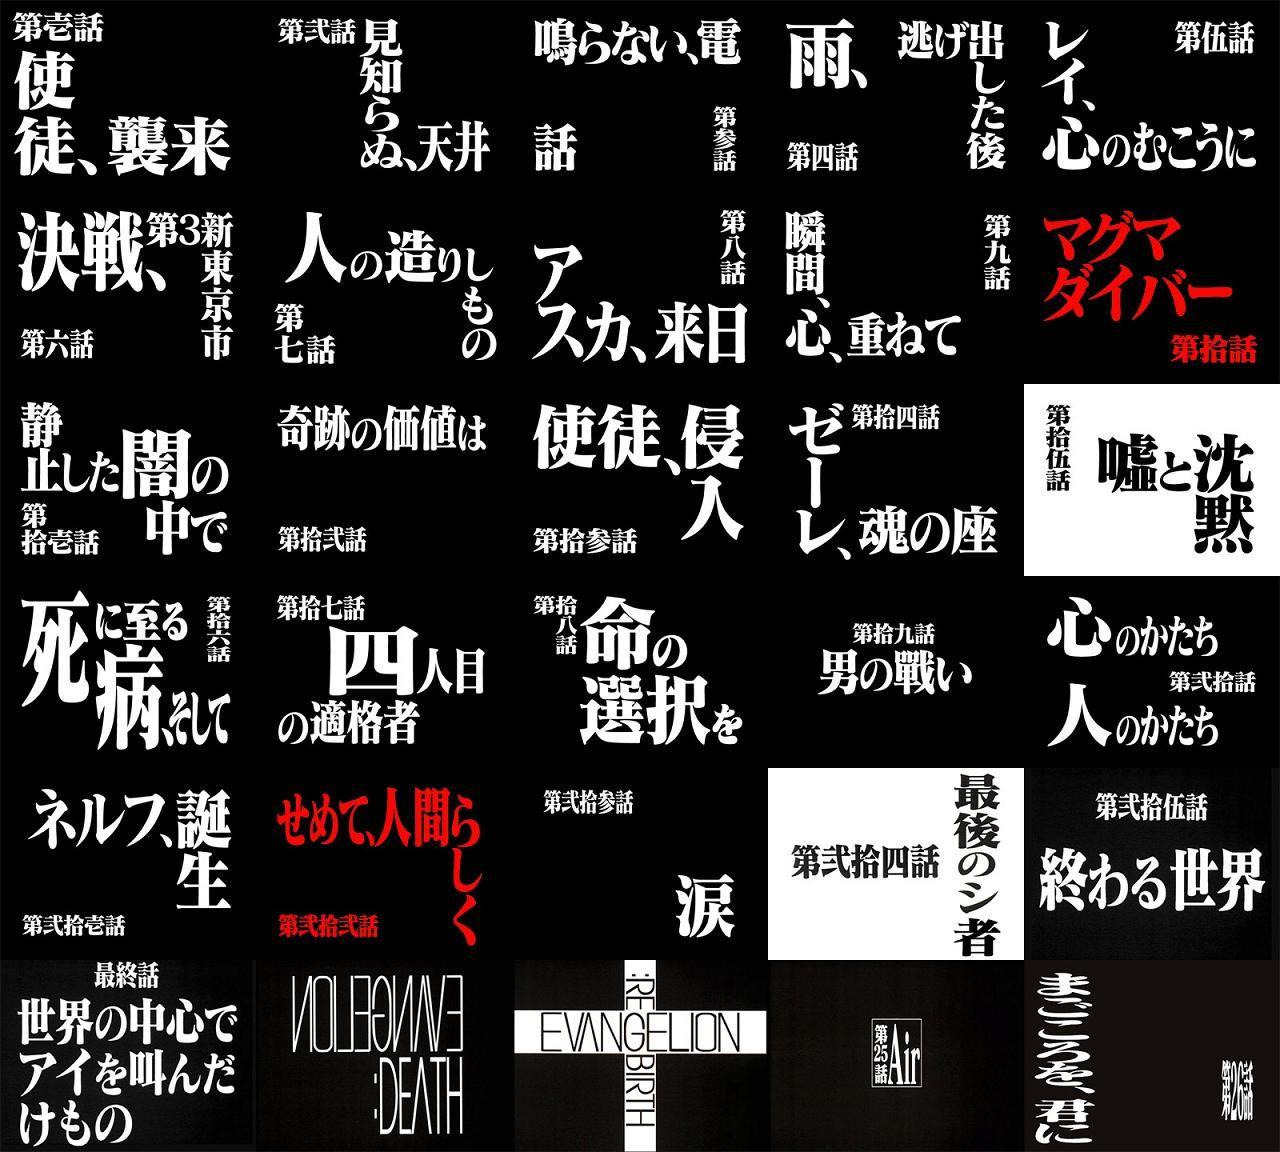 Neon Genesis Evangelion Title Screens Neon Genesis Evangelion Evangelion Art Wallpaper